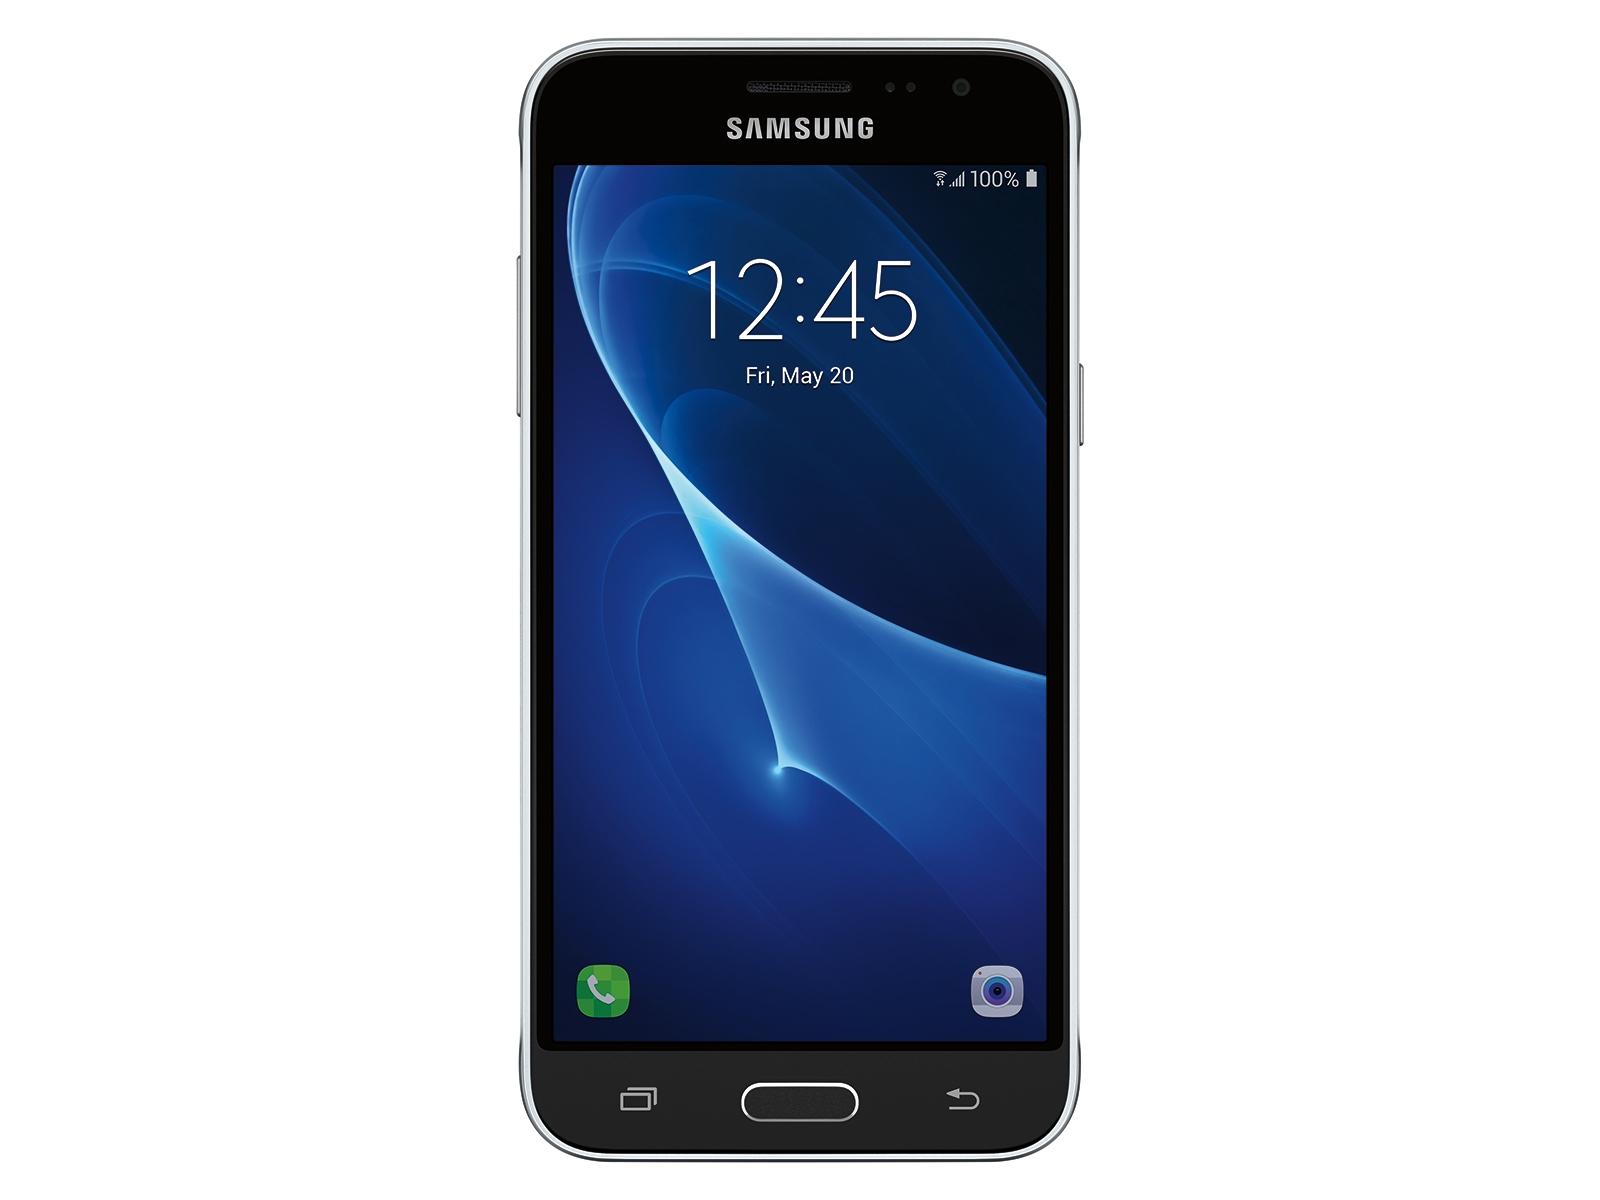 Galaxy J3 16gb Unlocked Phones Sm J320azkaxar Samsung Us